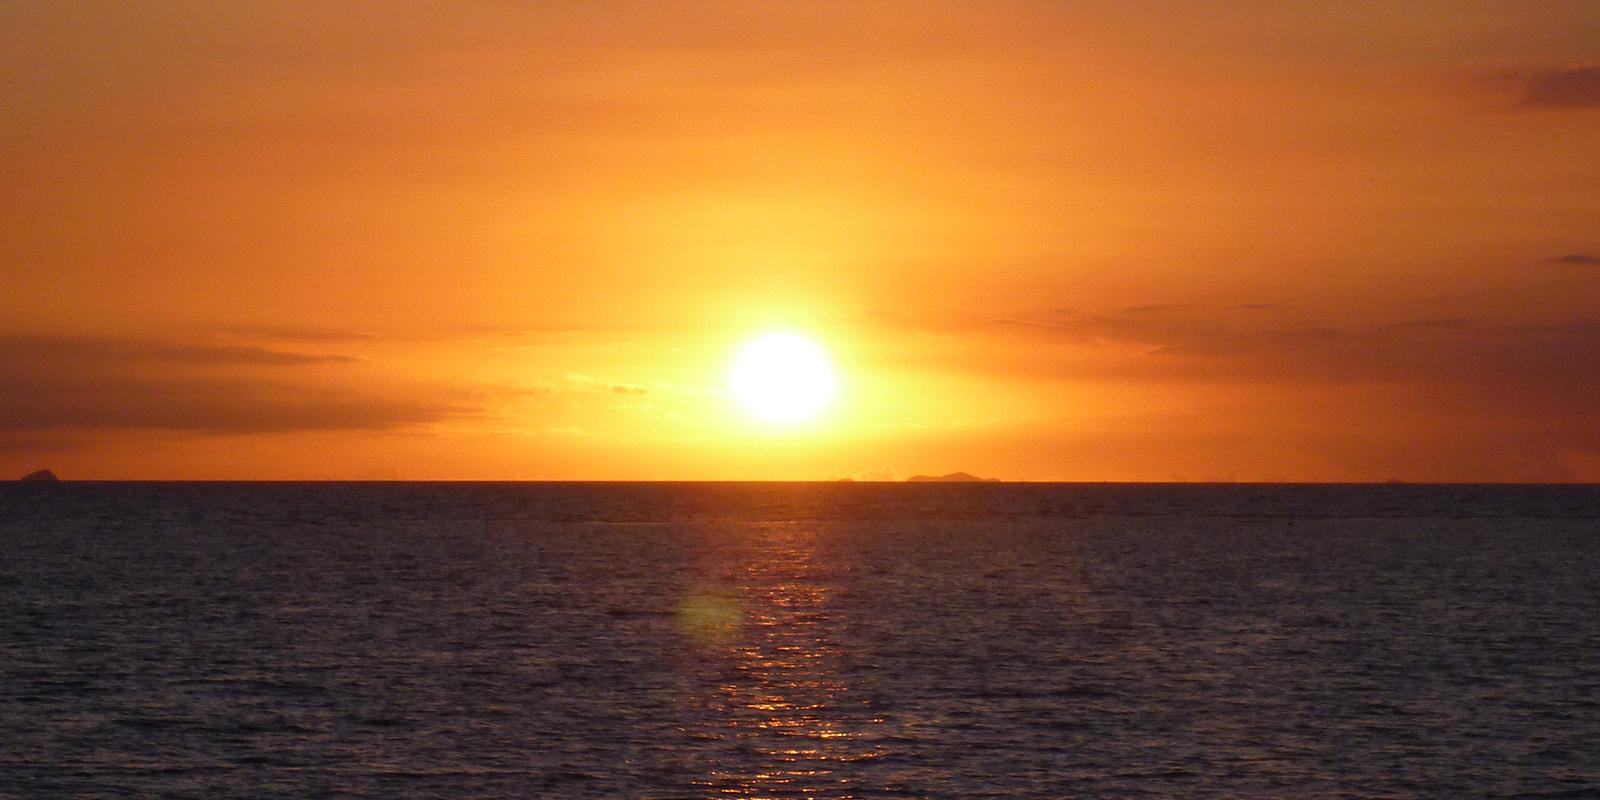 Spectrum TV sunset time lapse photo